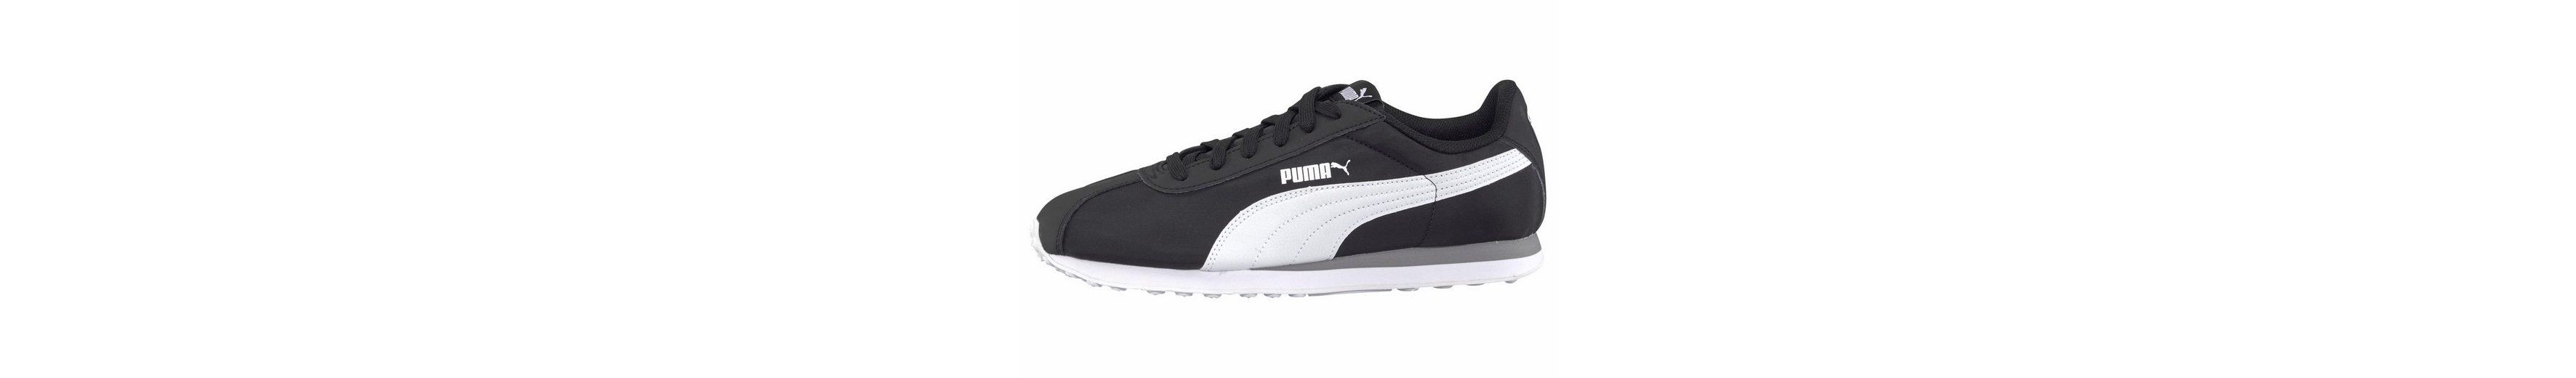 PUMA Turin NL Sneaker Zu Verkaufen Sehr Billig Billig Offiziellen Rabatt Großer Rabatt Abstand Rabatt Spielraum Mode-Stil RTOxE2ZAhe